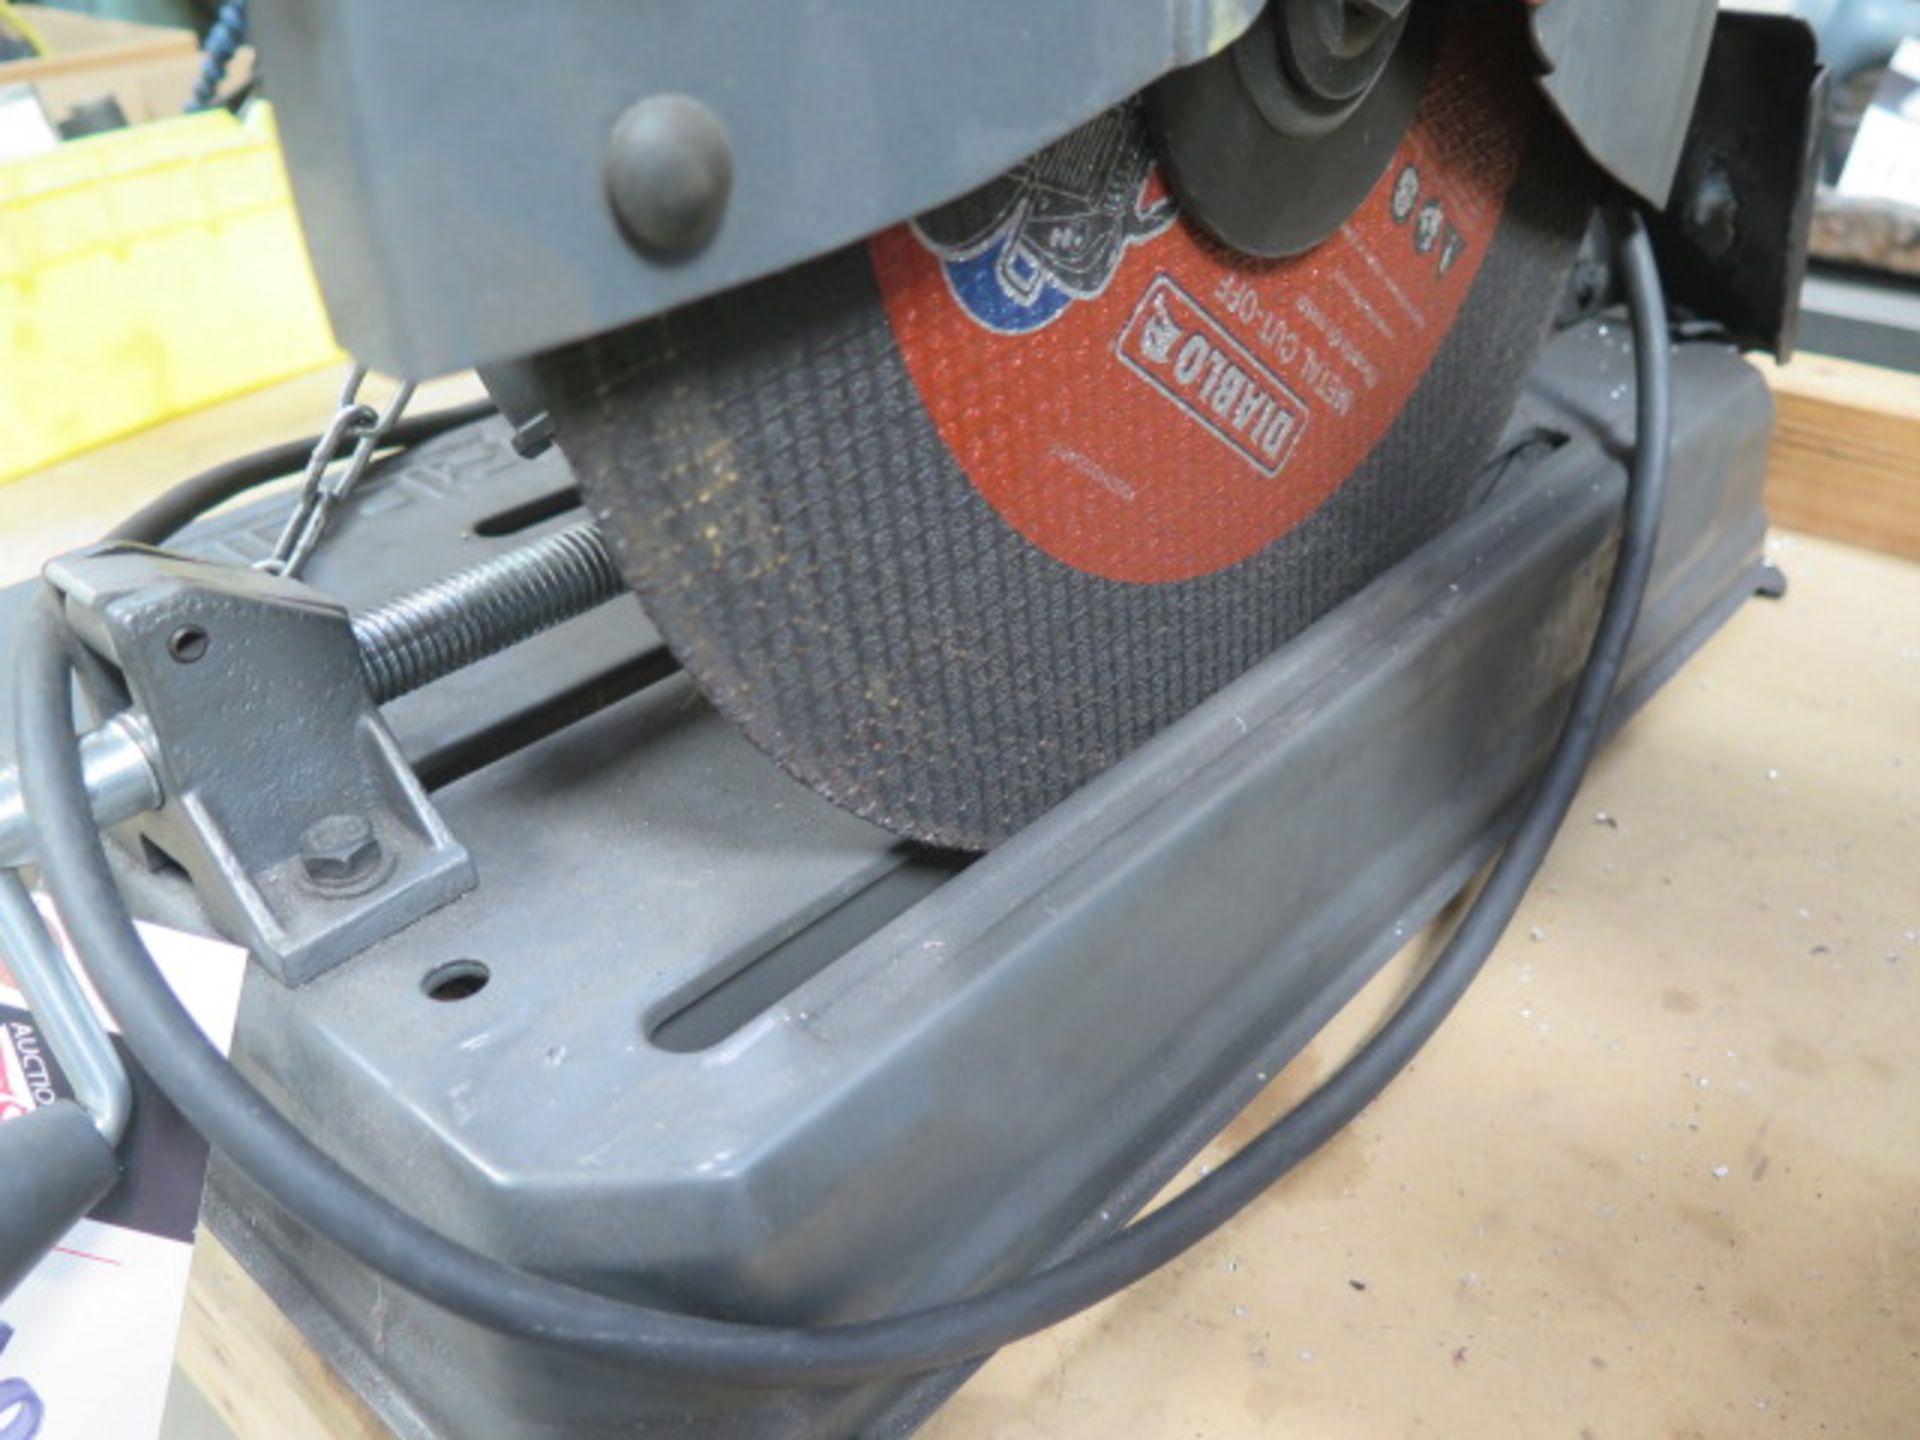 Ridgid Abrasive Cutoff Saw (SOLD AS-IS - NO WARRANTY) - Image 4 of 5